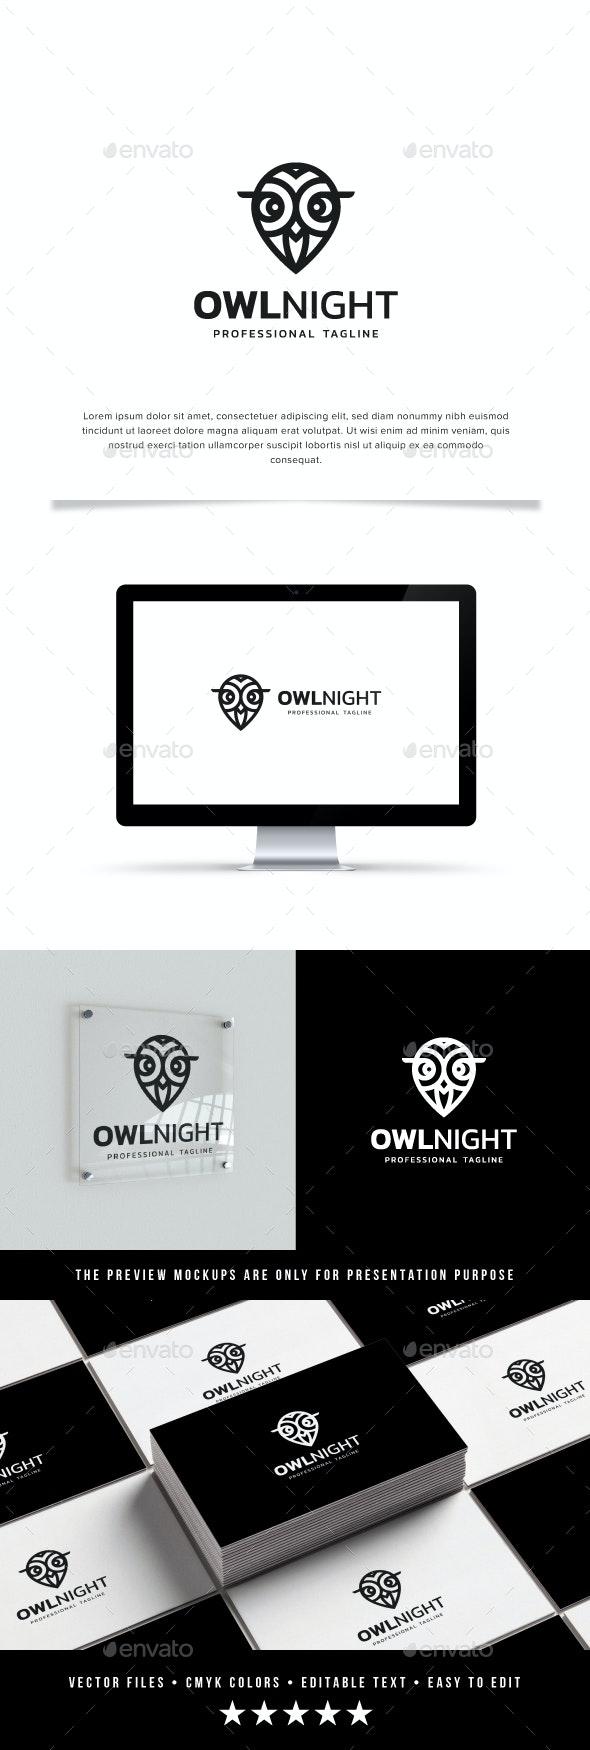 Owl Night Logo - Animals Logo Templates